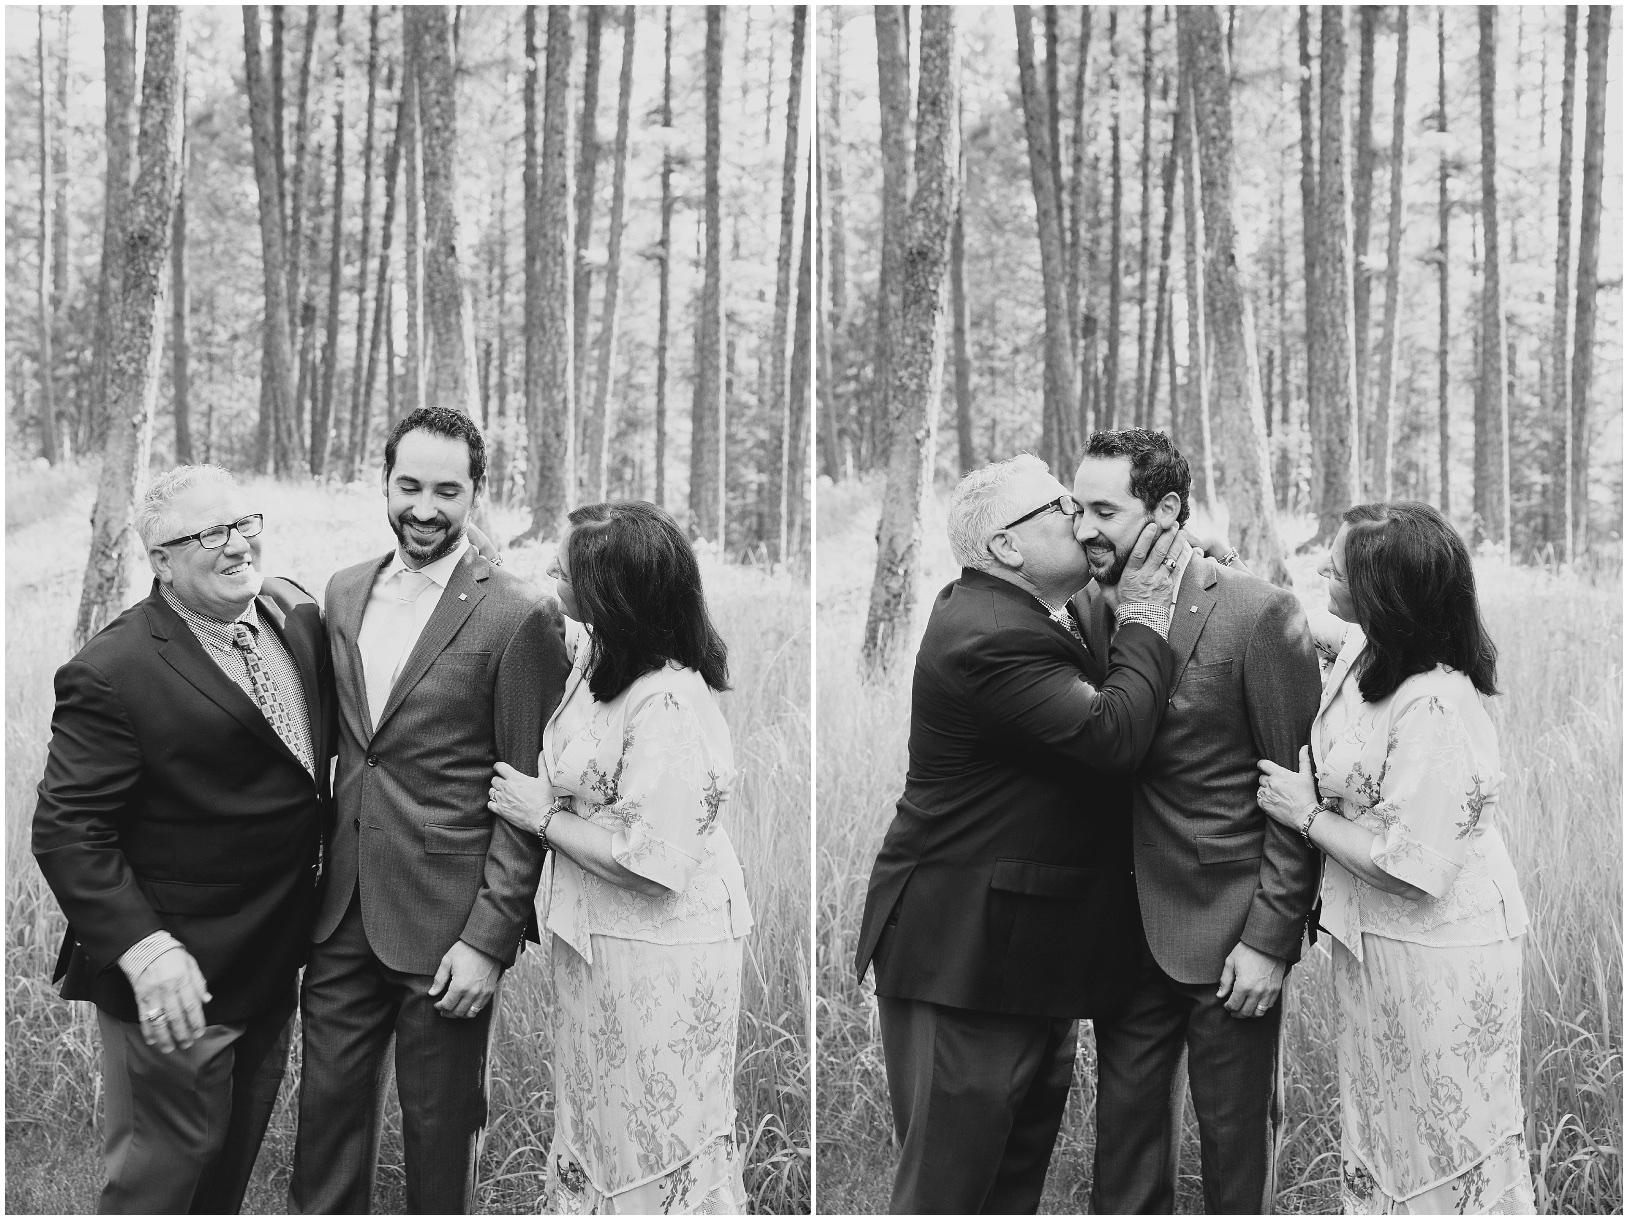 lindseyjane_wedding060.jpg